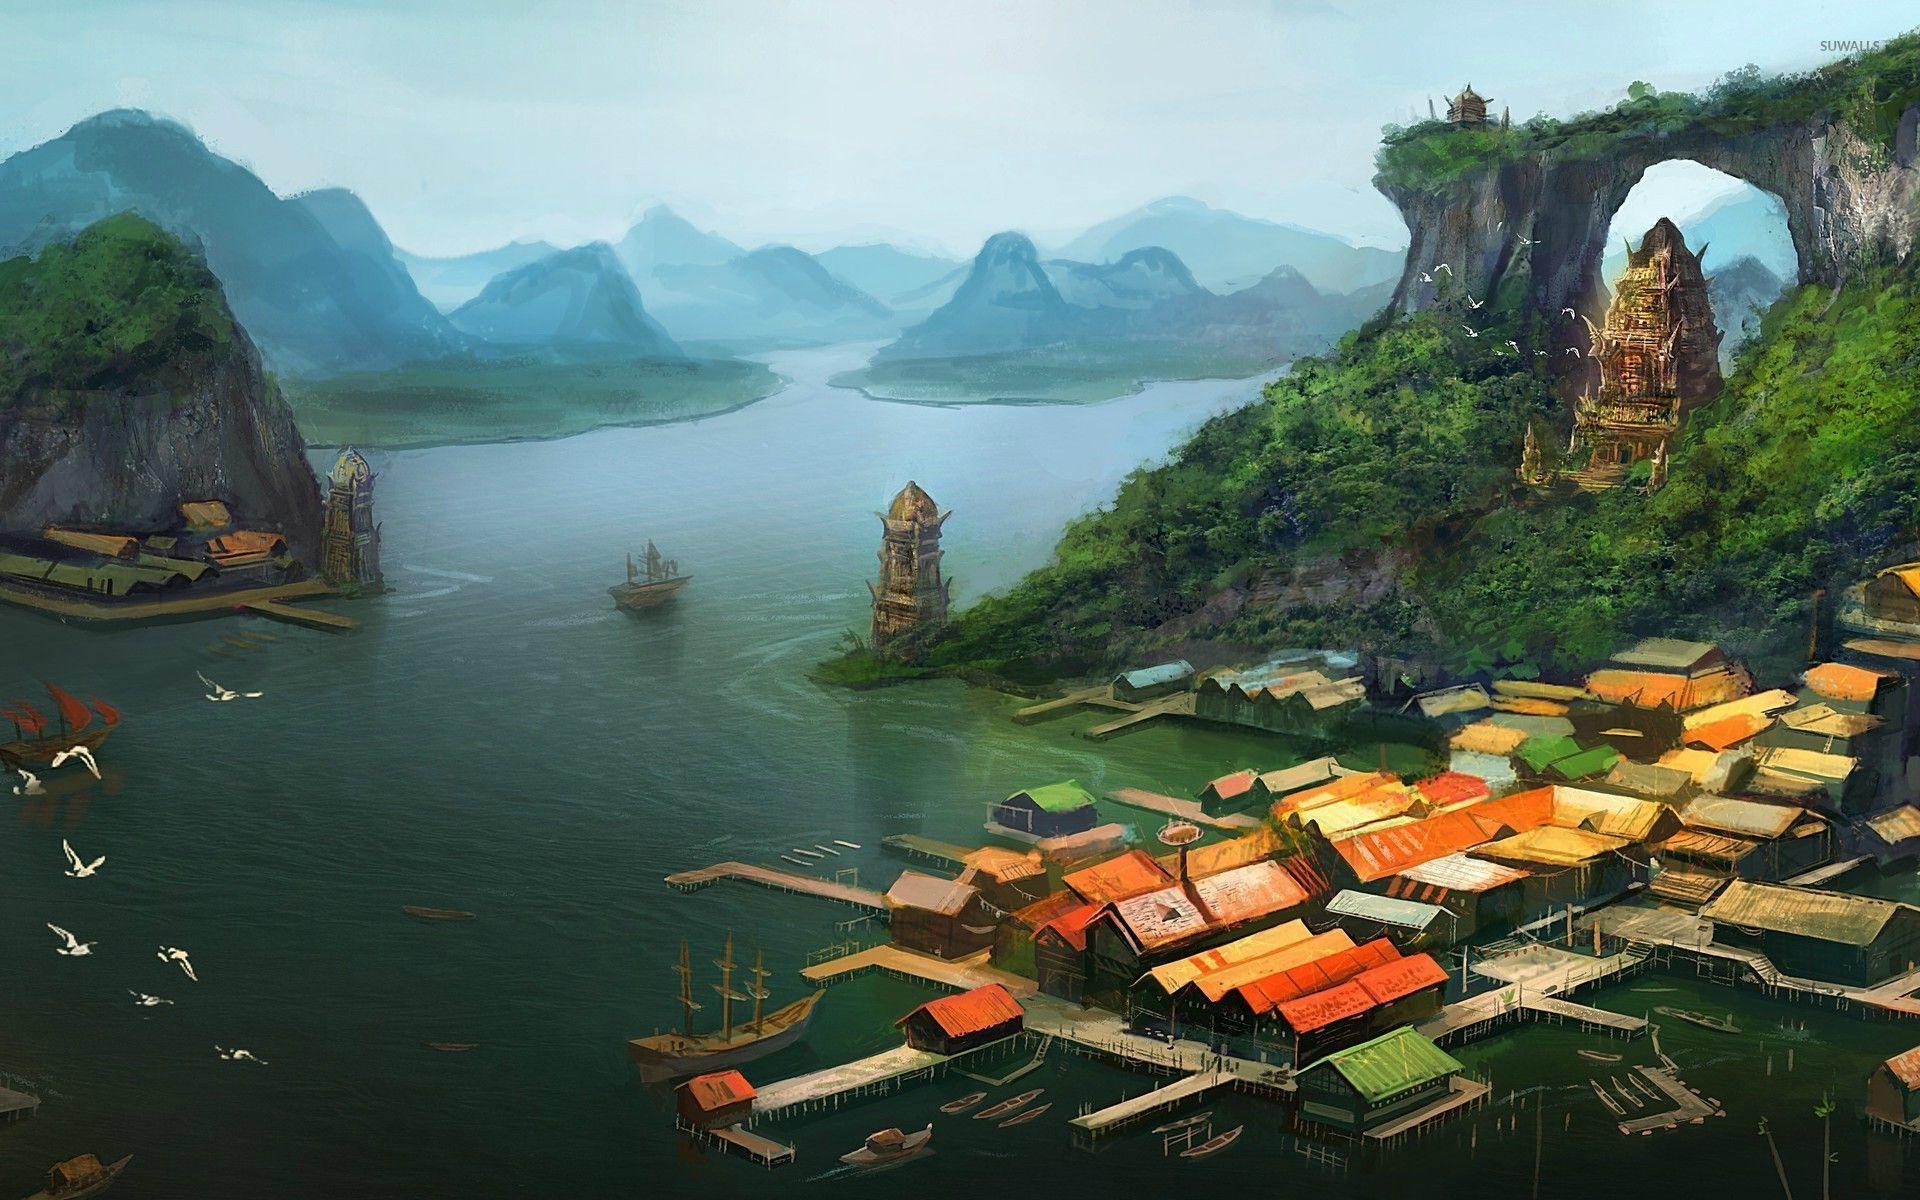 Amazing Wallpaper Mountain Polygon - town-in-the-lagoon-26628-1920x1200  Image_416452.jpg